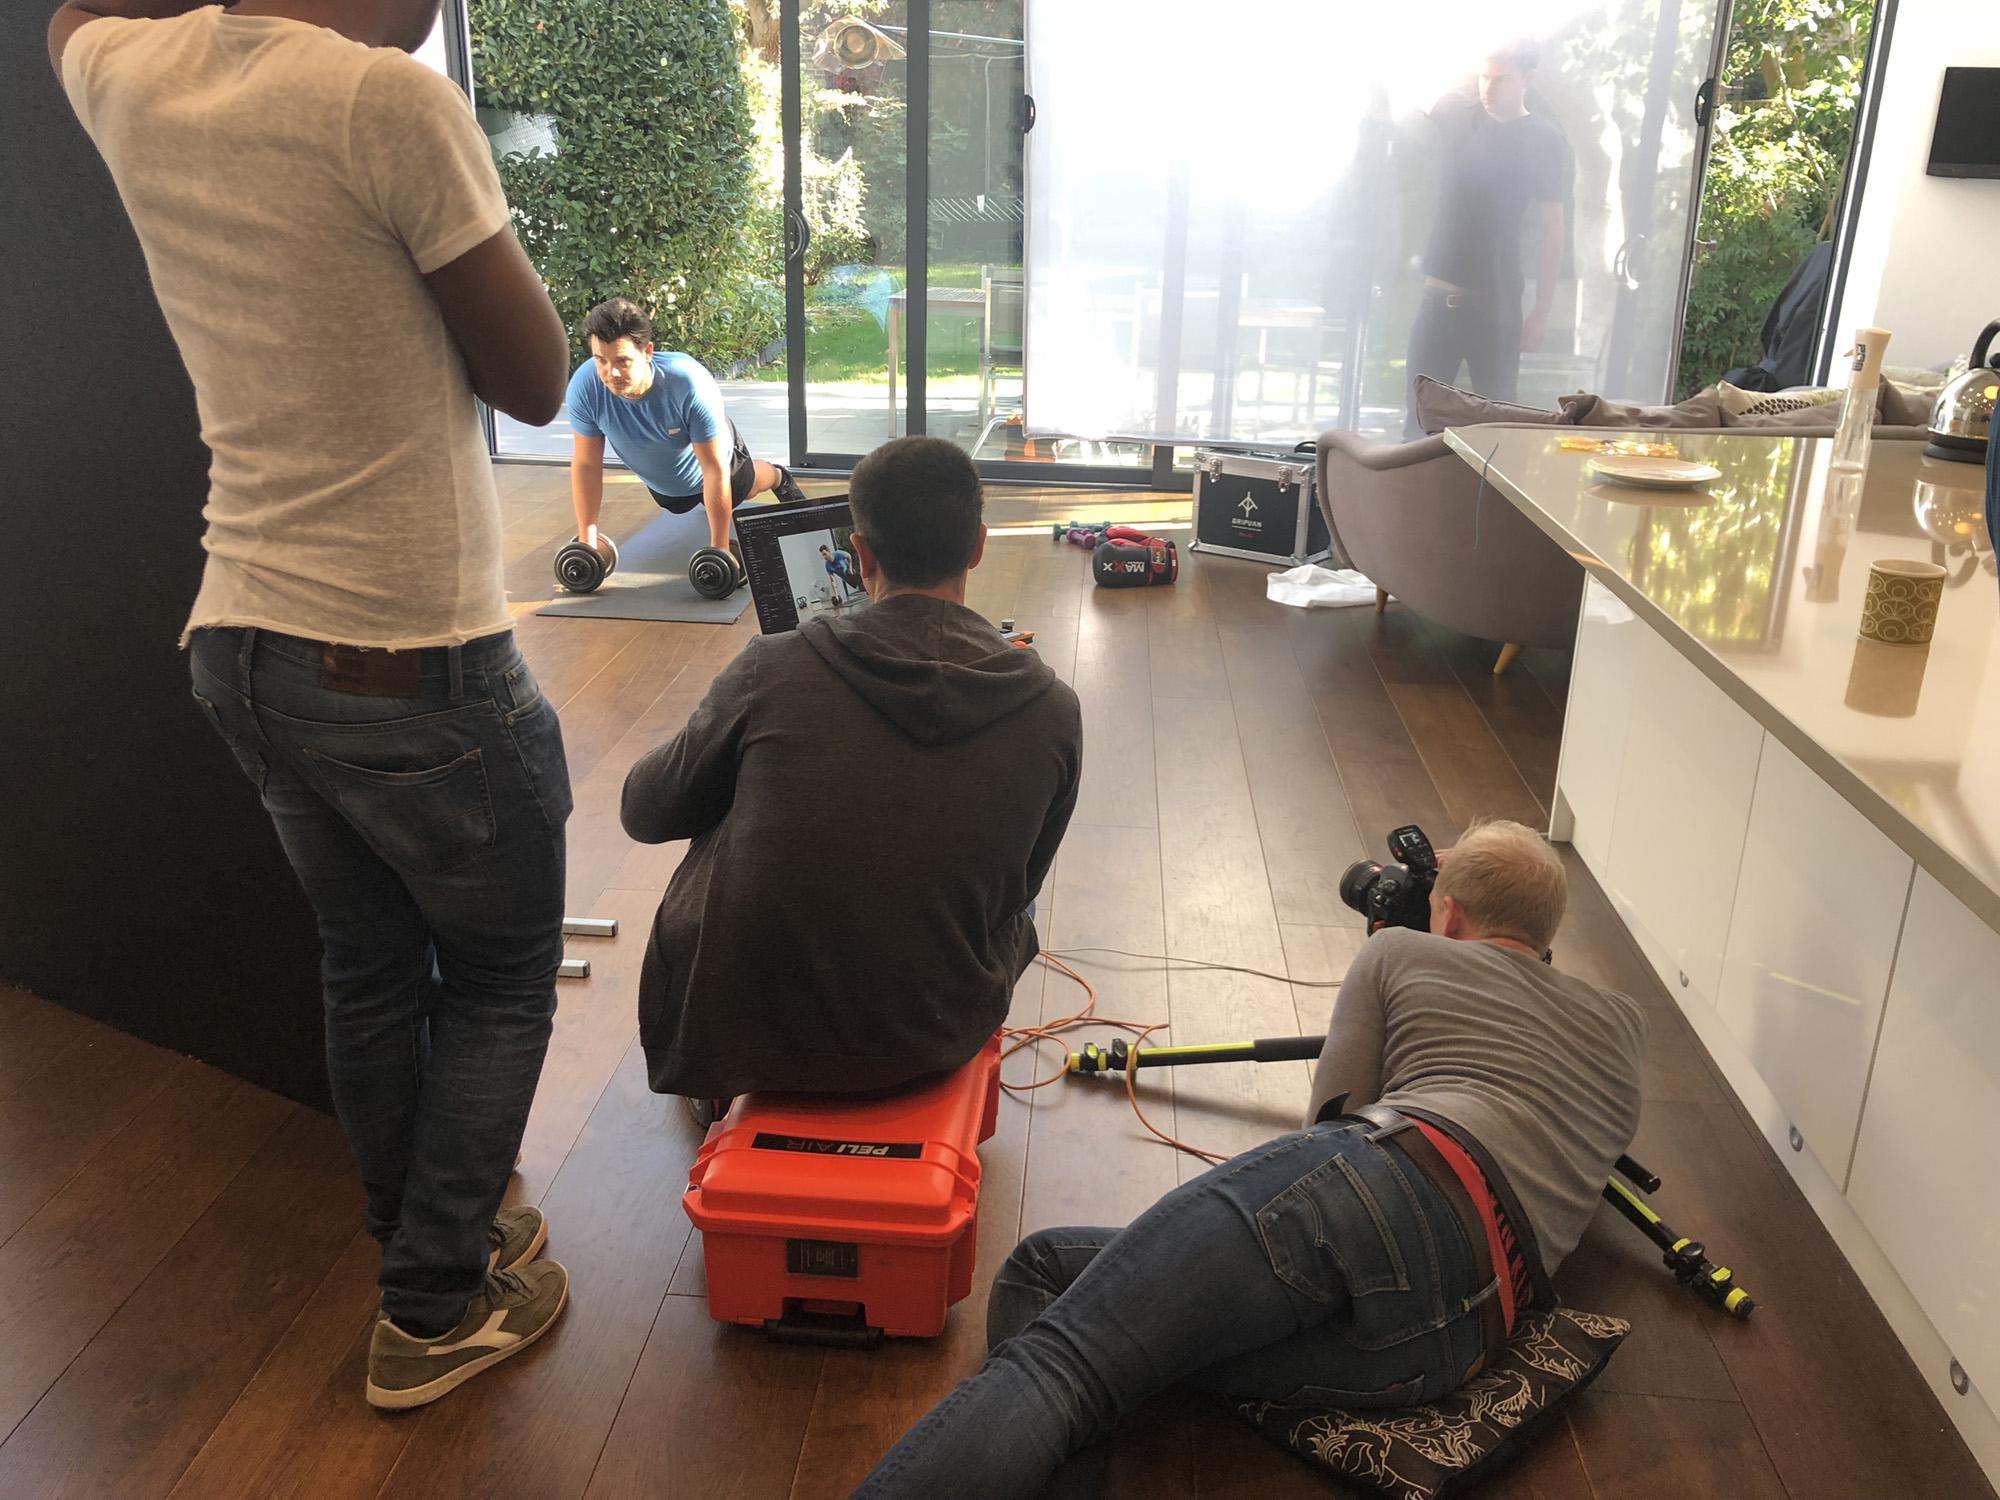 behind the scenes photoshoot